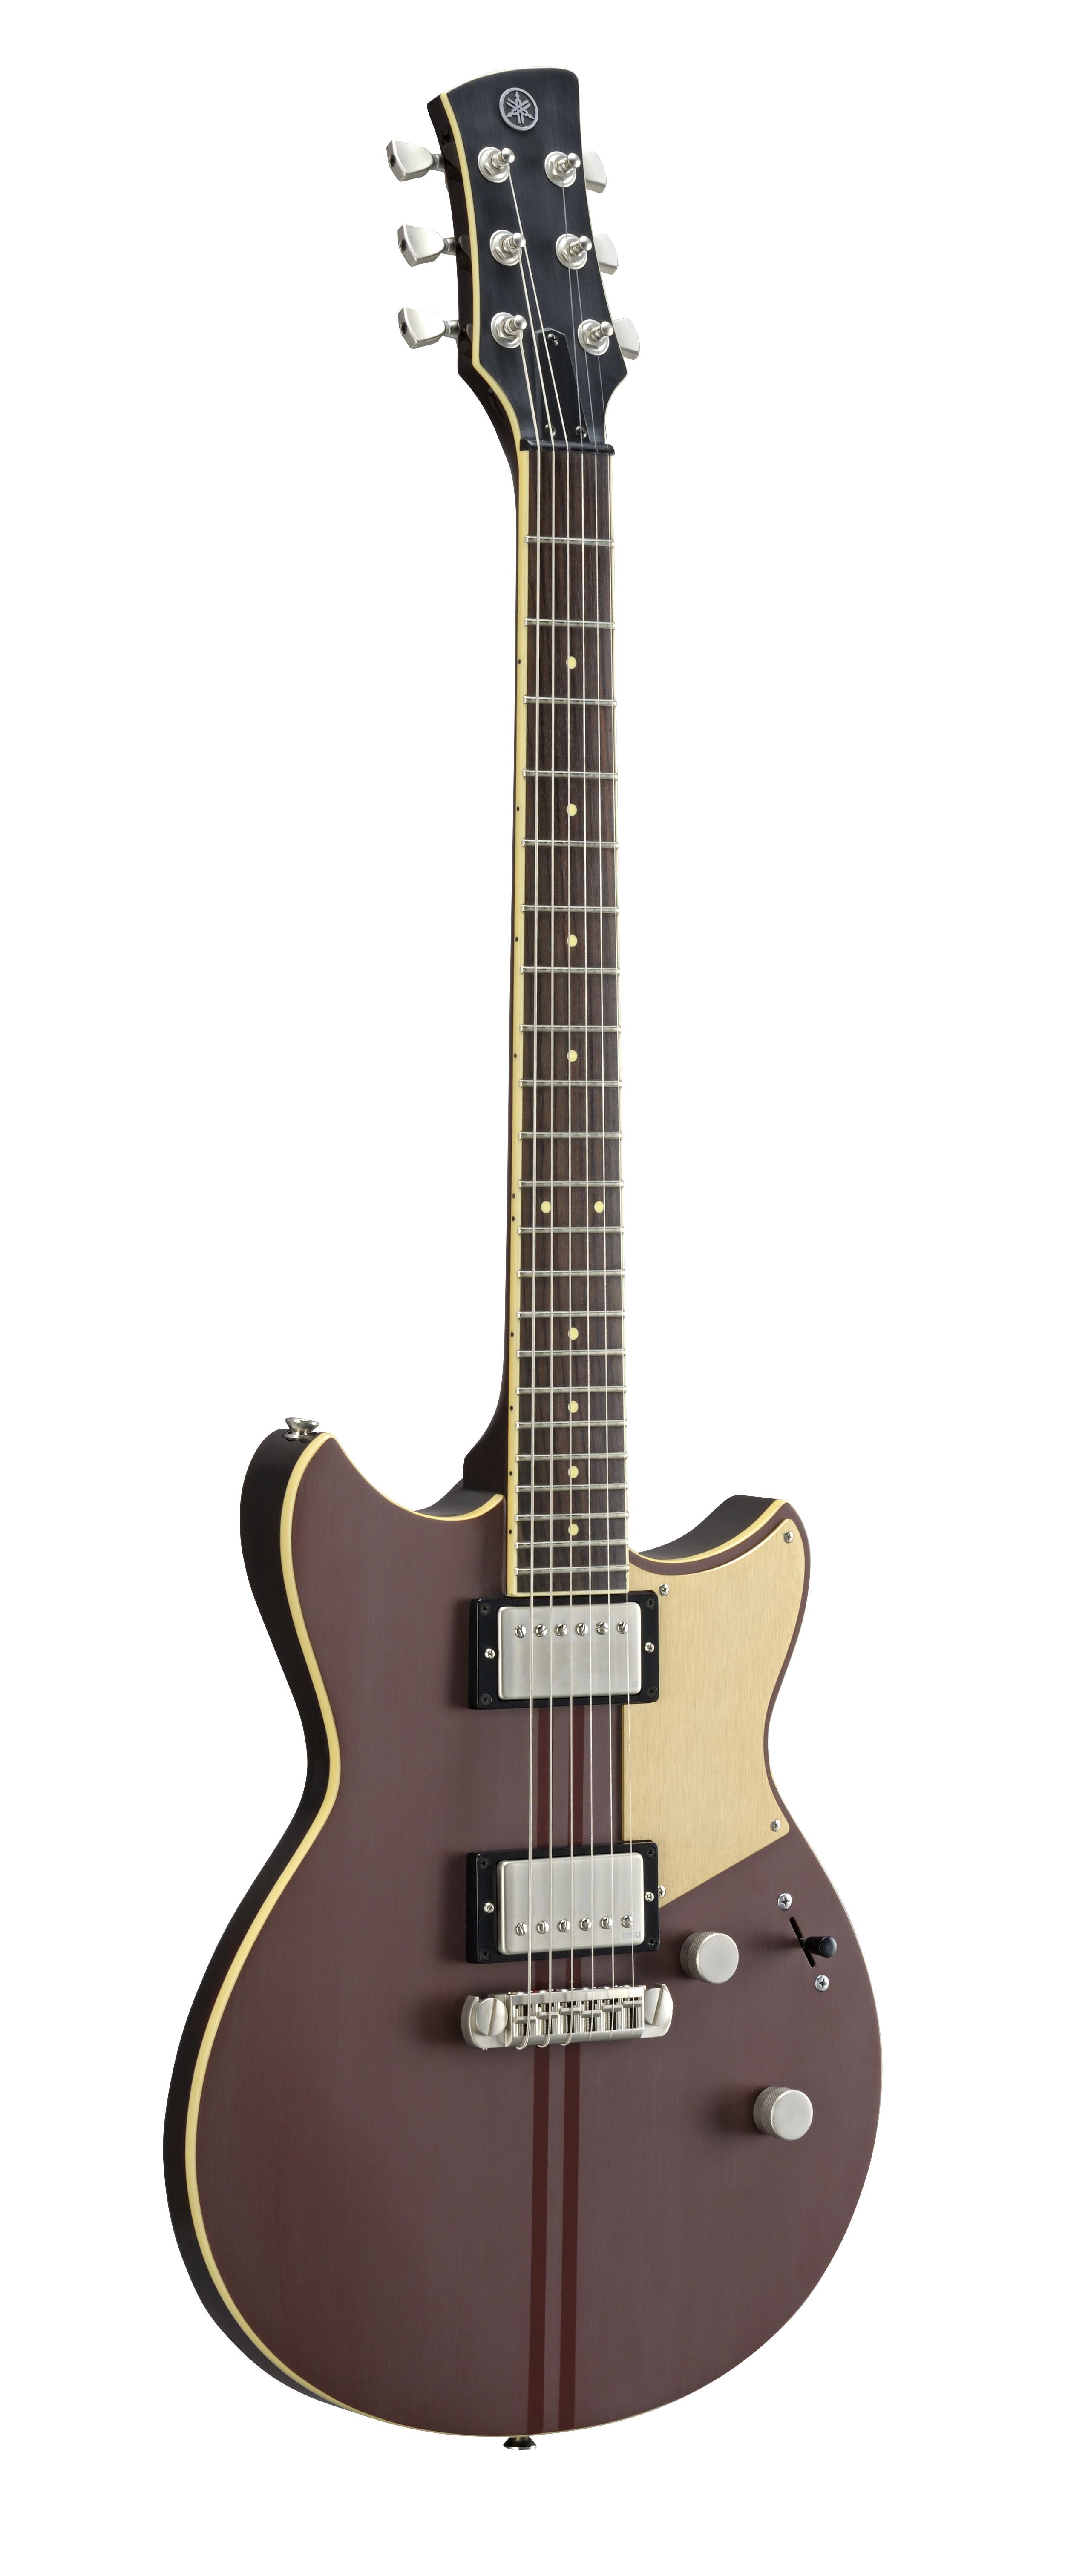 yamaha revstar rs820cr electric guitar steel rust yamaha music london. Black Bedroom Furniture Sets. Home Design Ideas